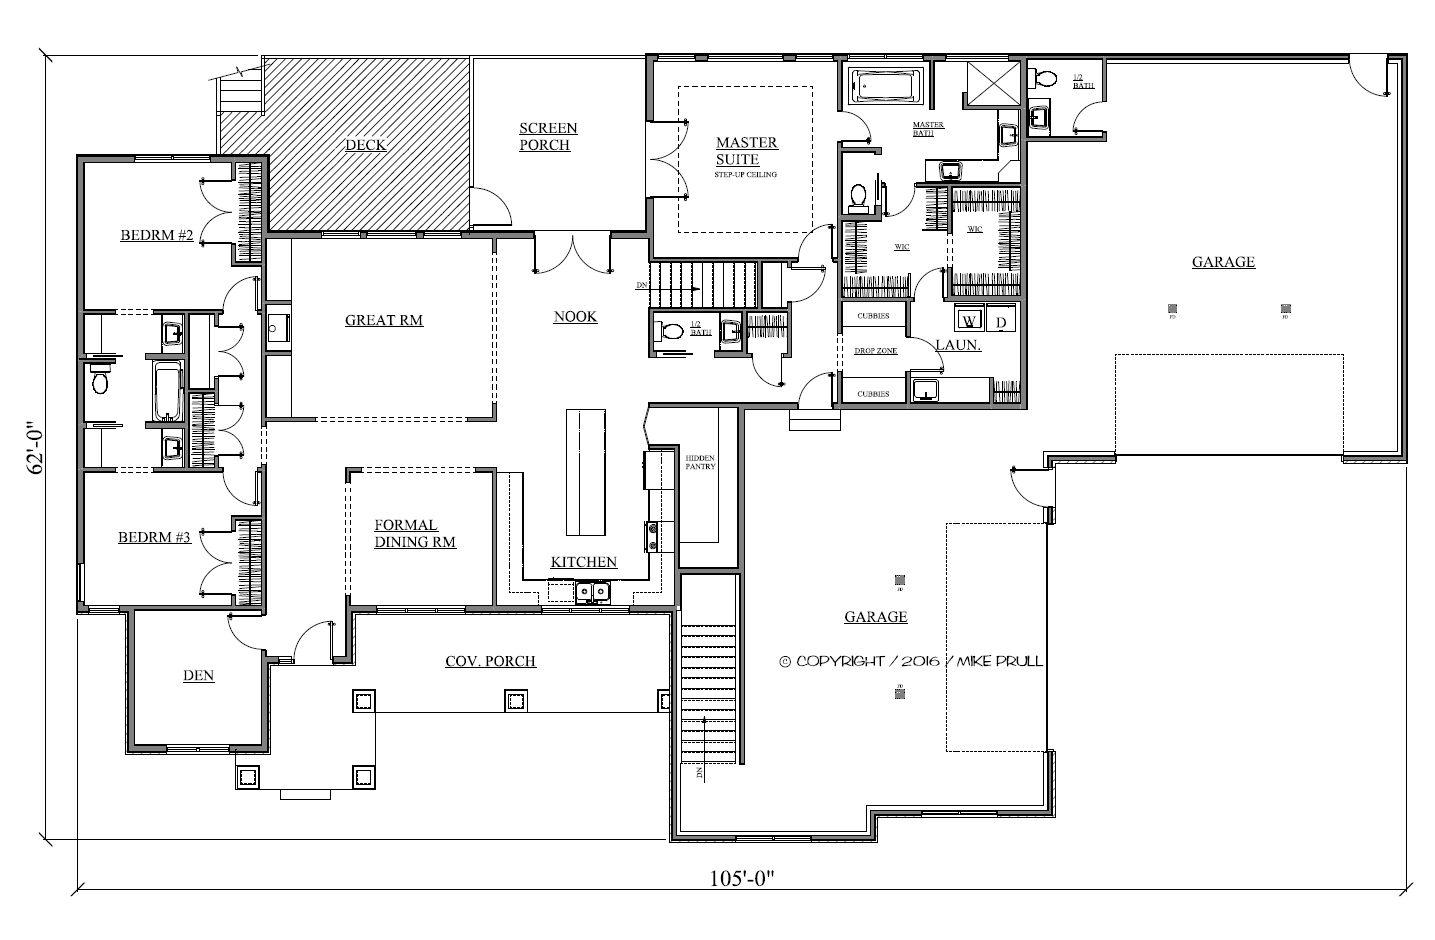 2535r 573 16 prull custom home designs house plans for Design homes iowa